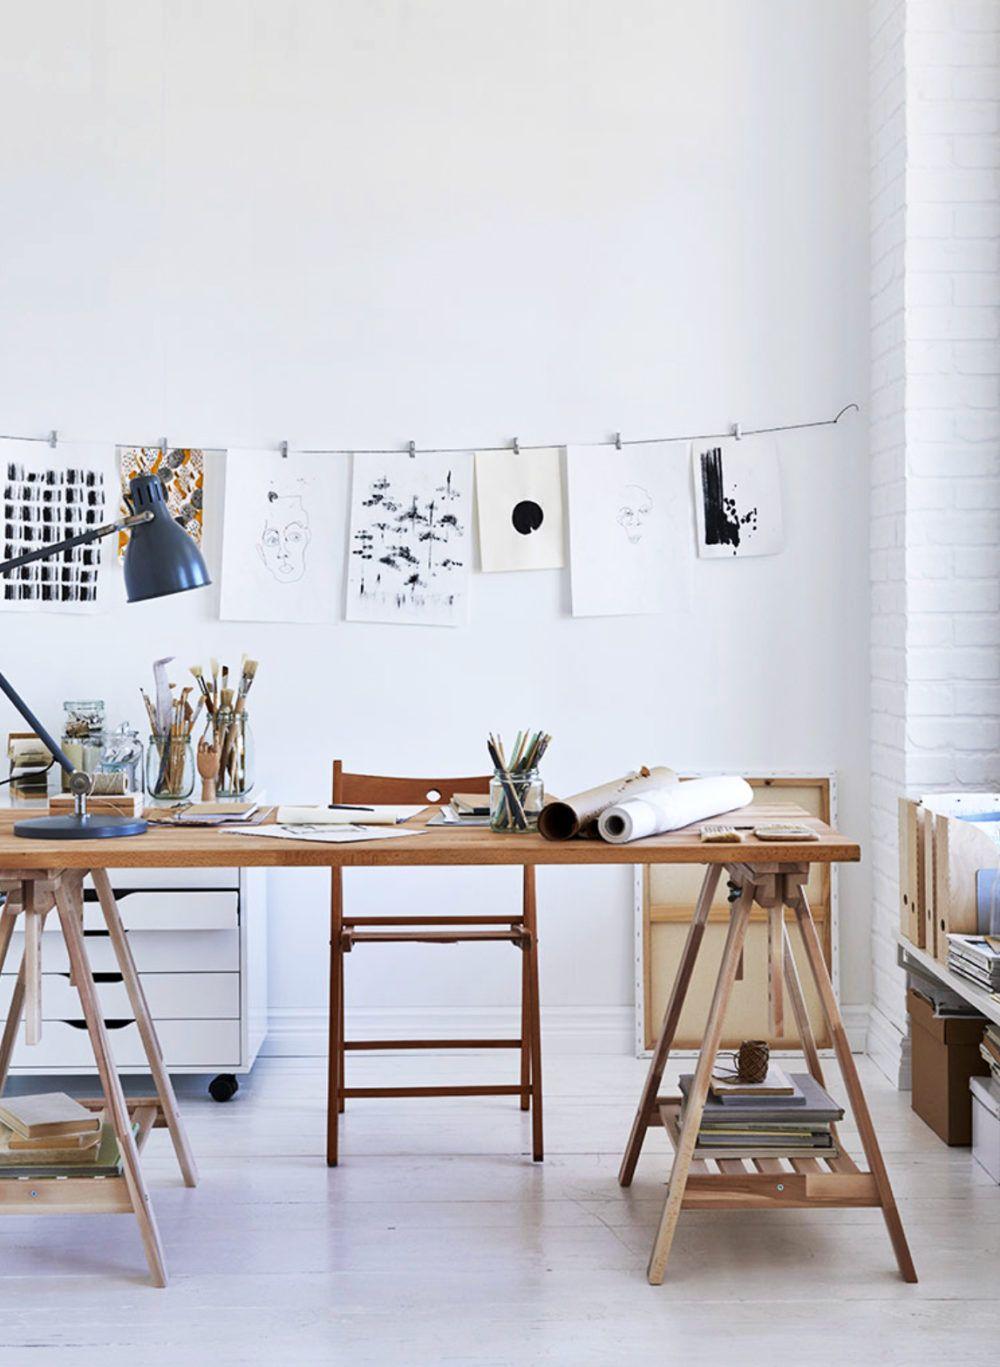 whitewashed art studio with sleek sawhorse table workspace. #workspace #artstudio #studio #whitewashed #paint #painting #sawhorsetable #sawhorsedesk #sawhorselegs #tasklamp #walldecor